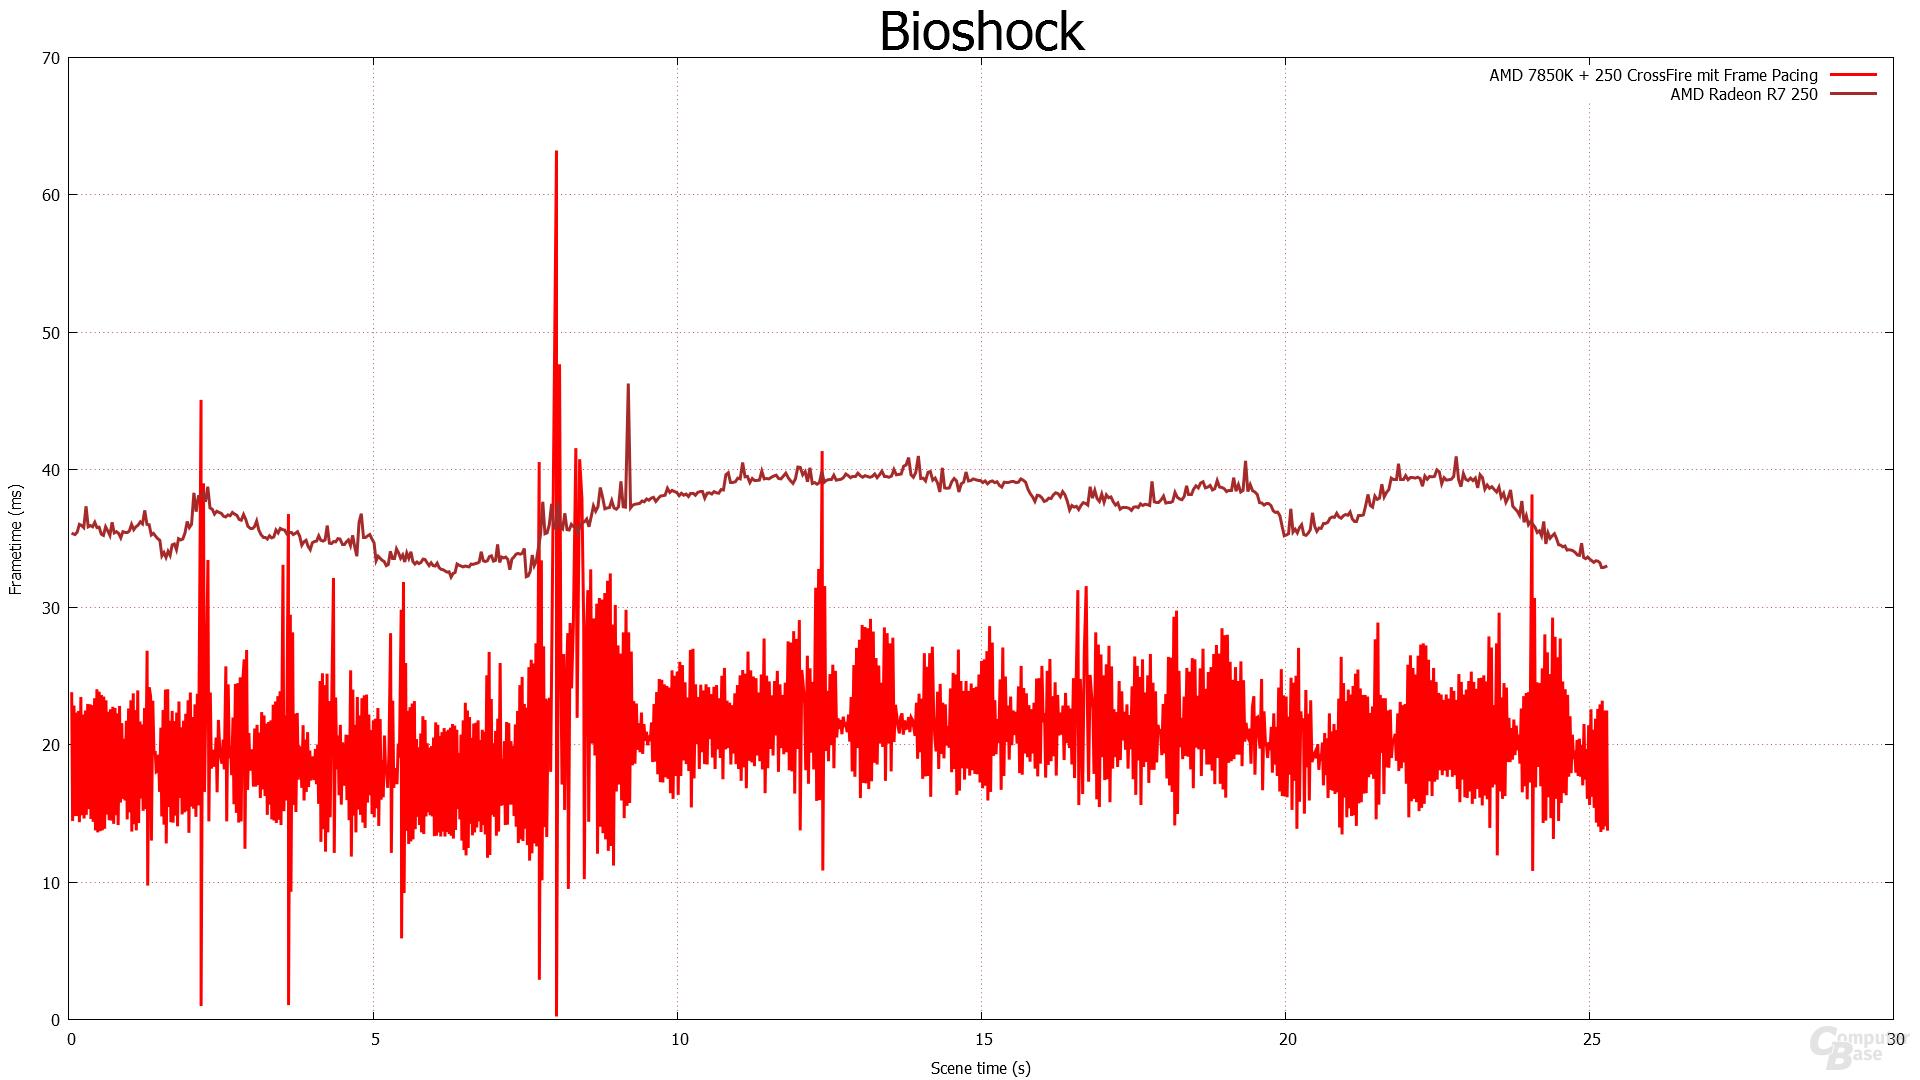 Frametimes - Bioshock